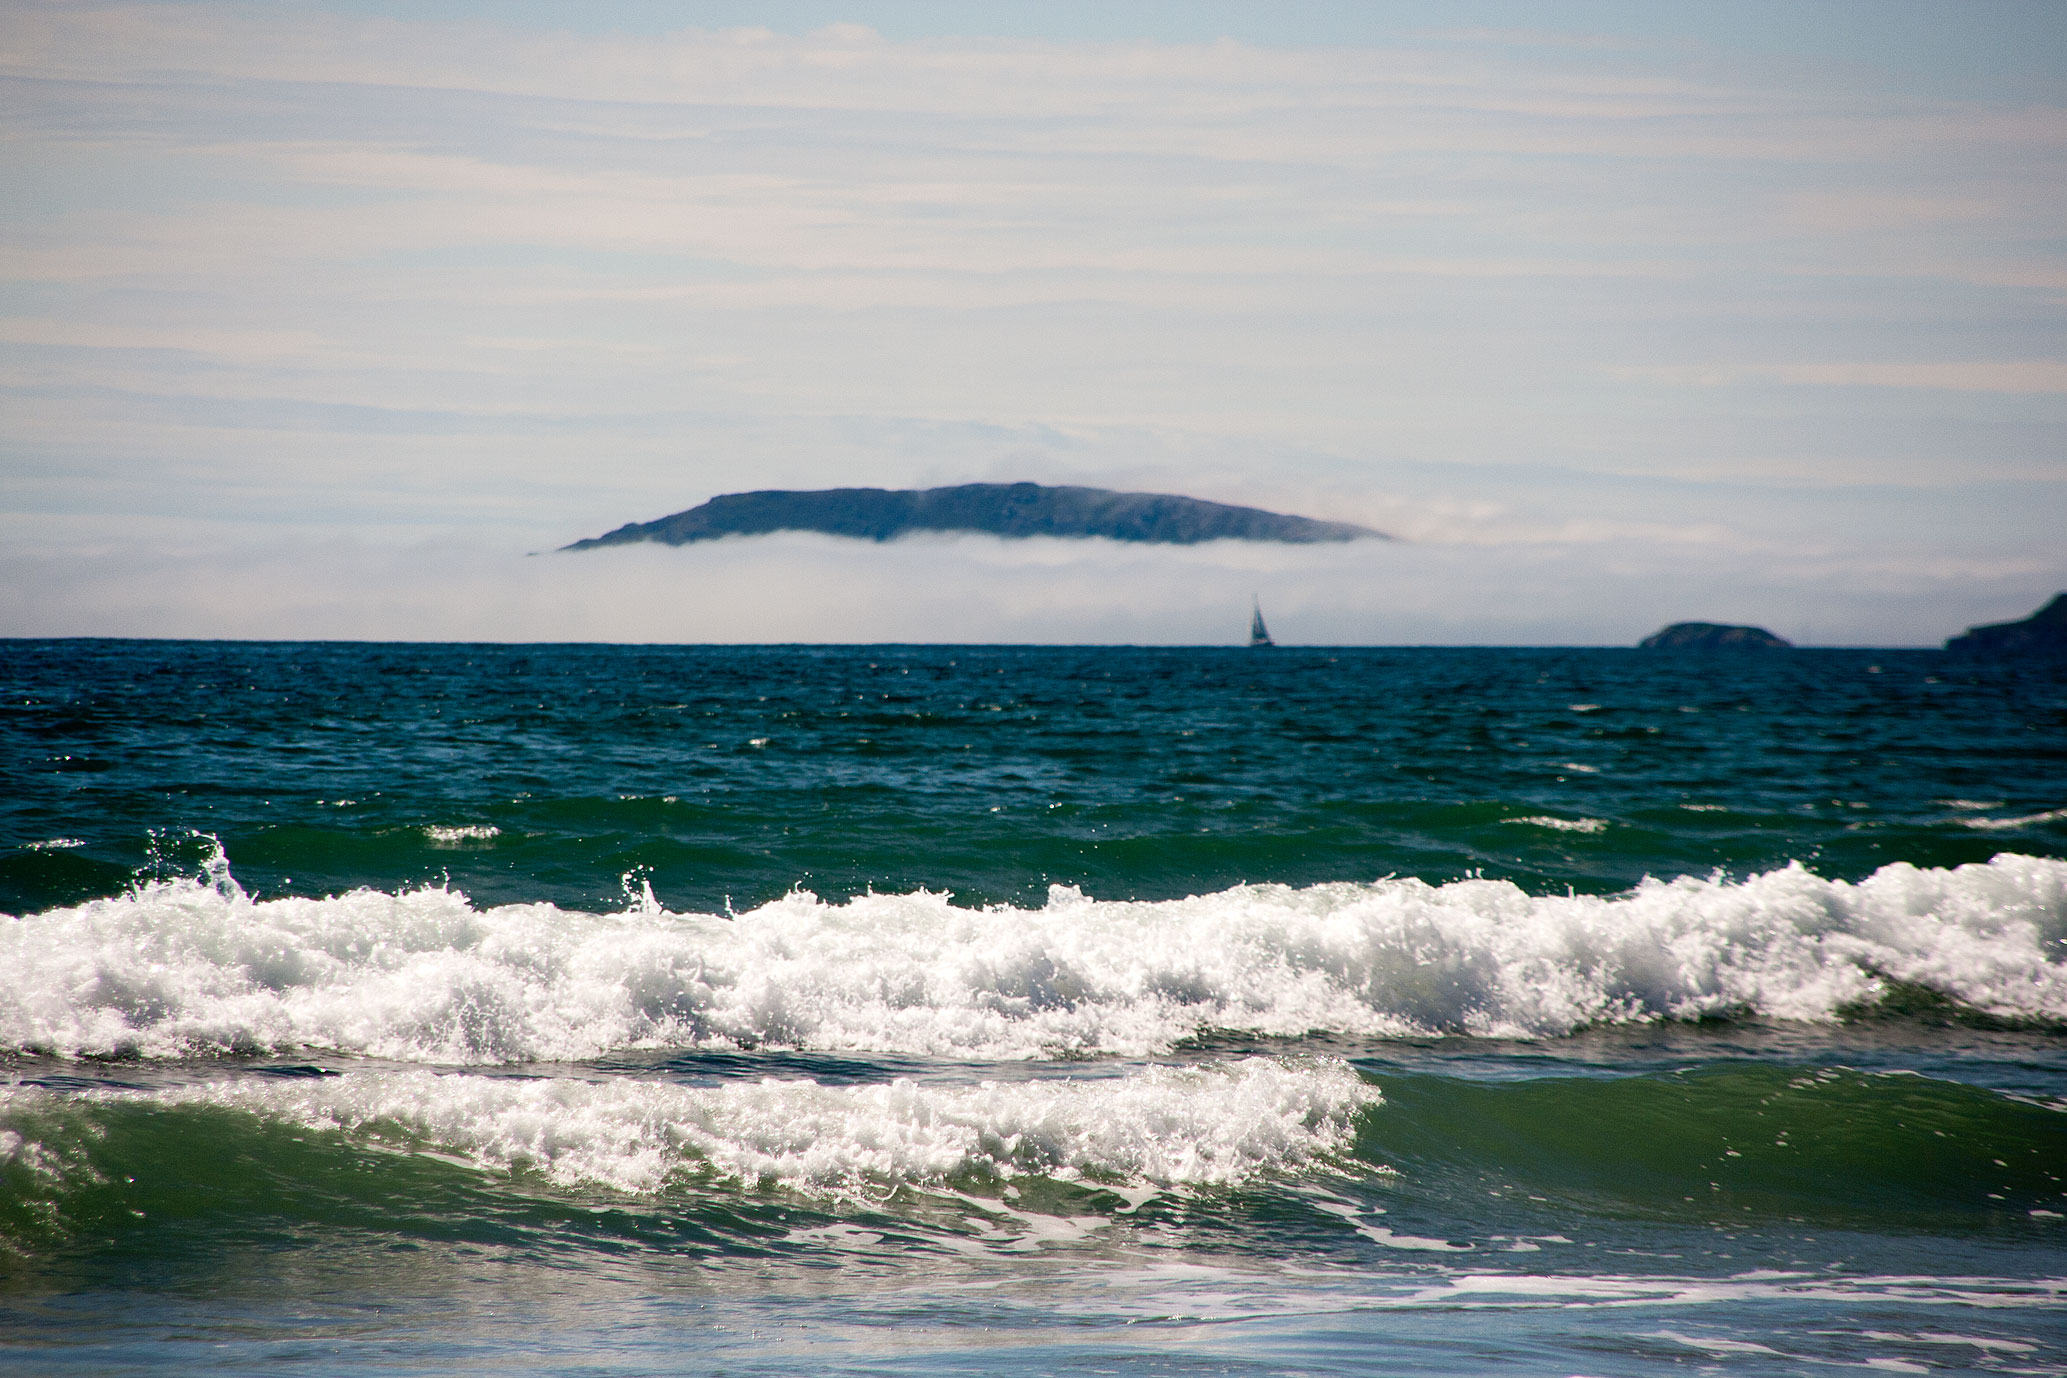 Bardsey island fog bank